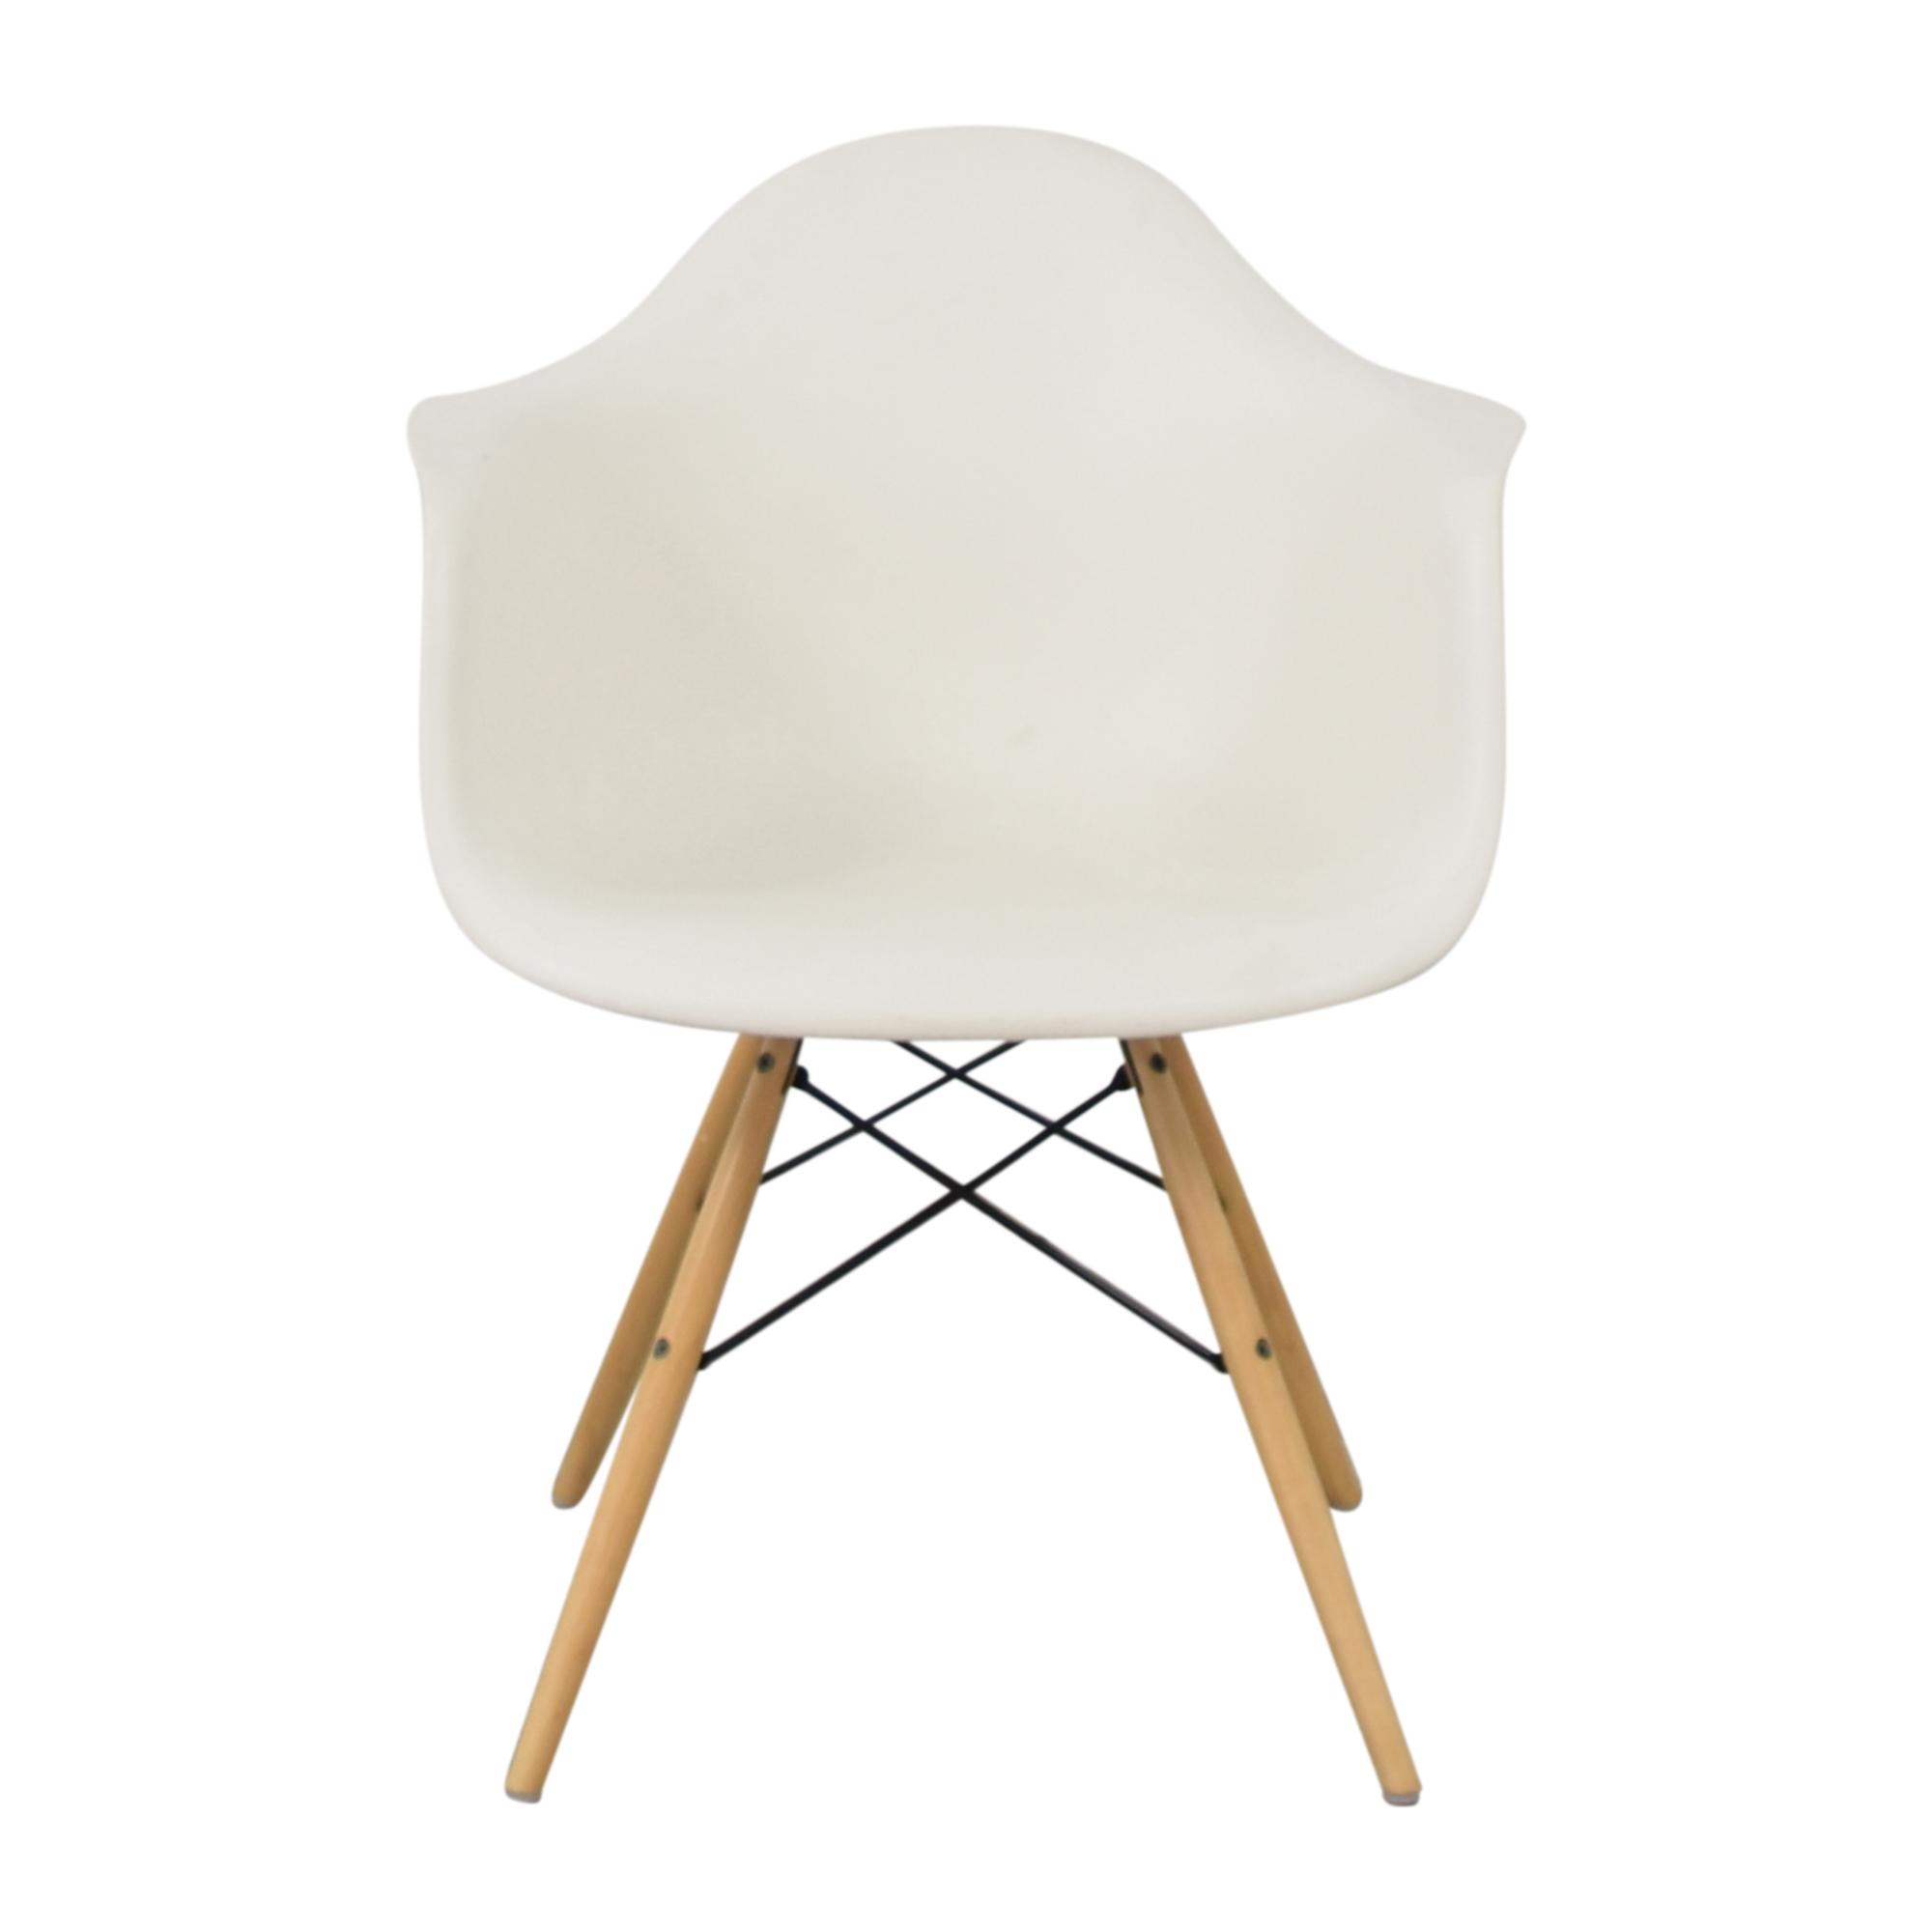 Herman Miller Herman Miller Eames Molded Arm Chair nyc